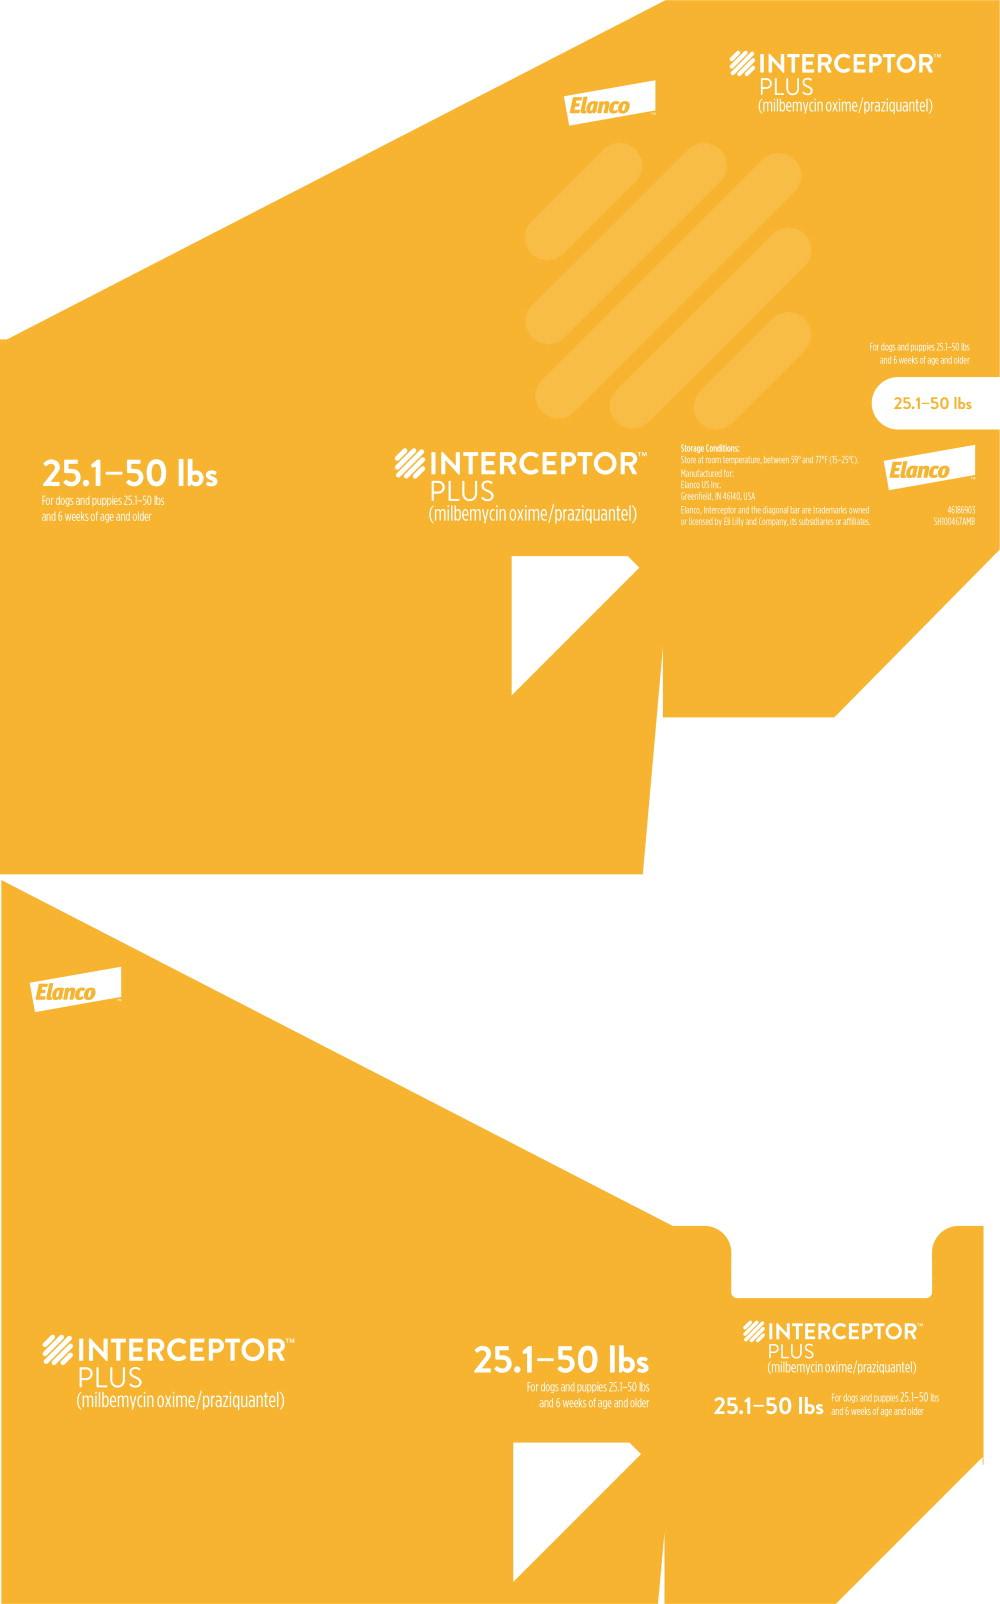 Principal Display Panel - Interceptor Plus 25.1-50 lbs Box Label